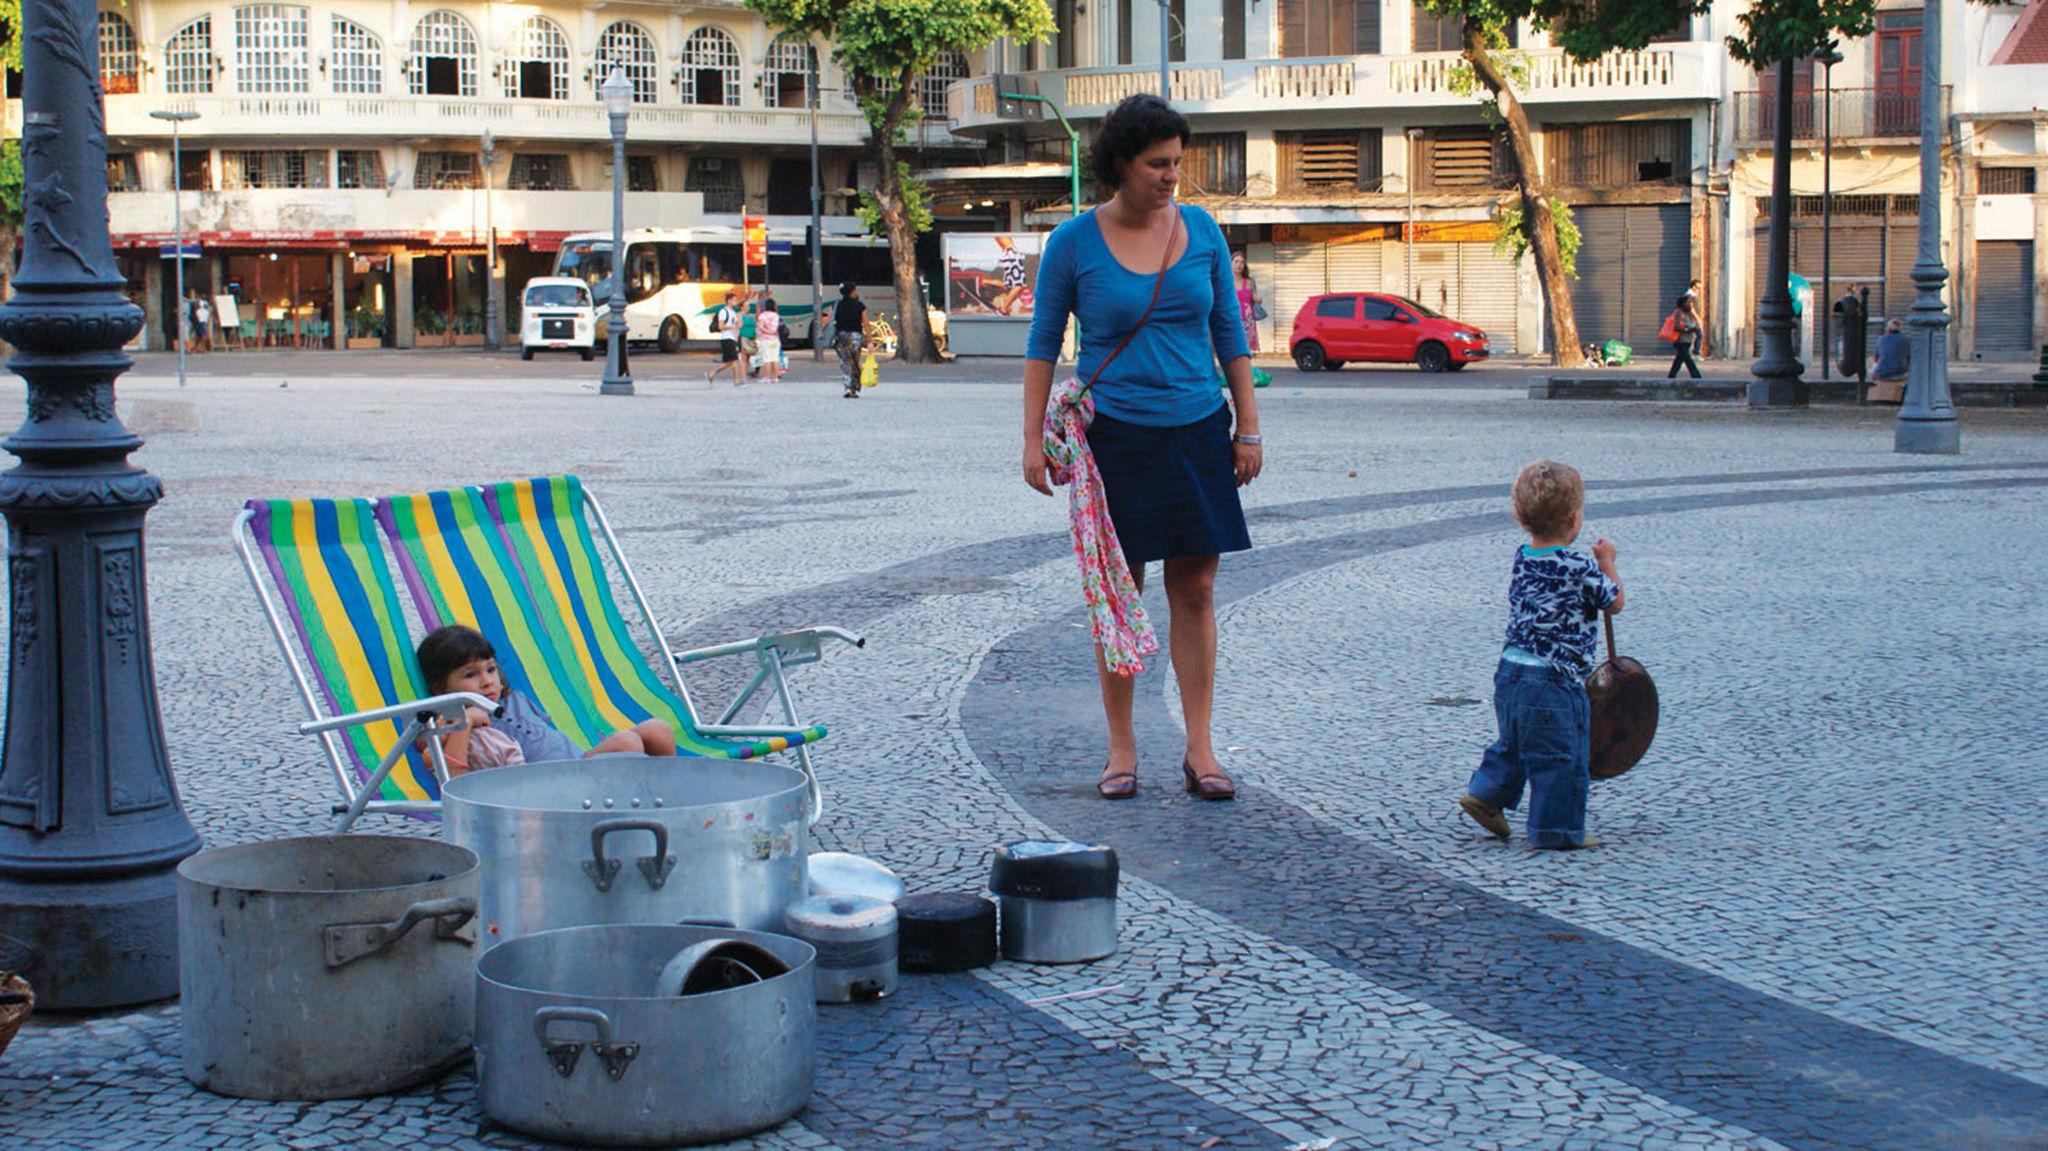 transat on the square Opavivará  Roberto Cabot Stream 03  PCA-Stream